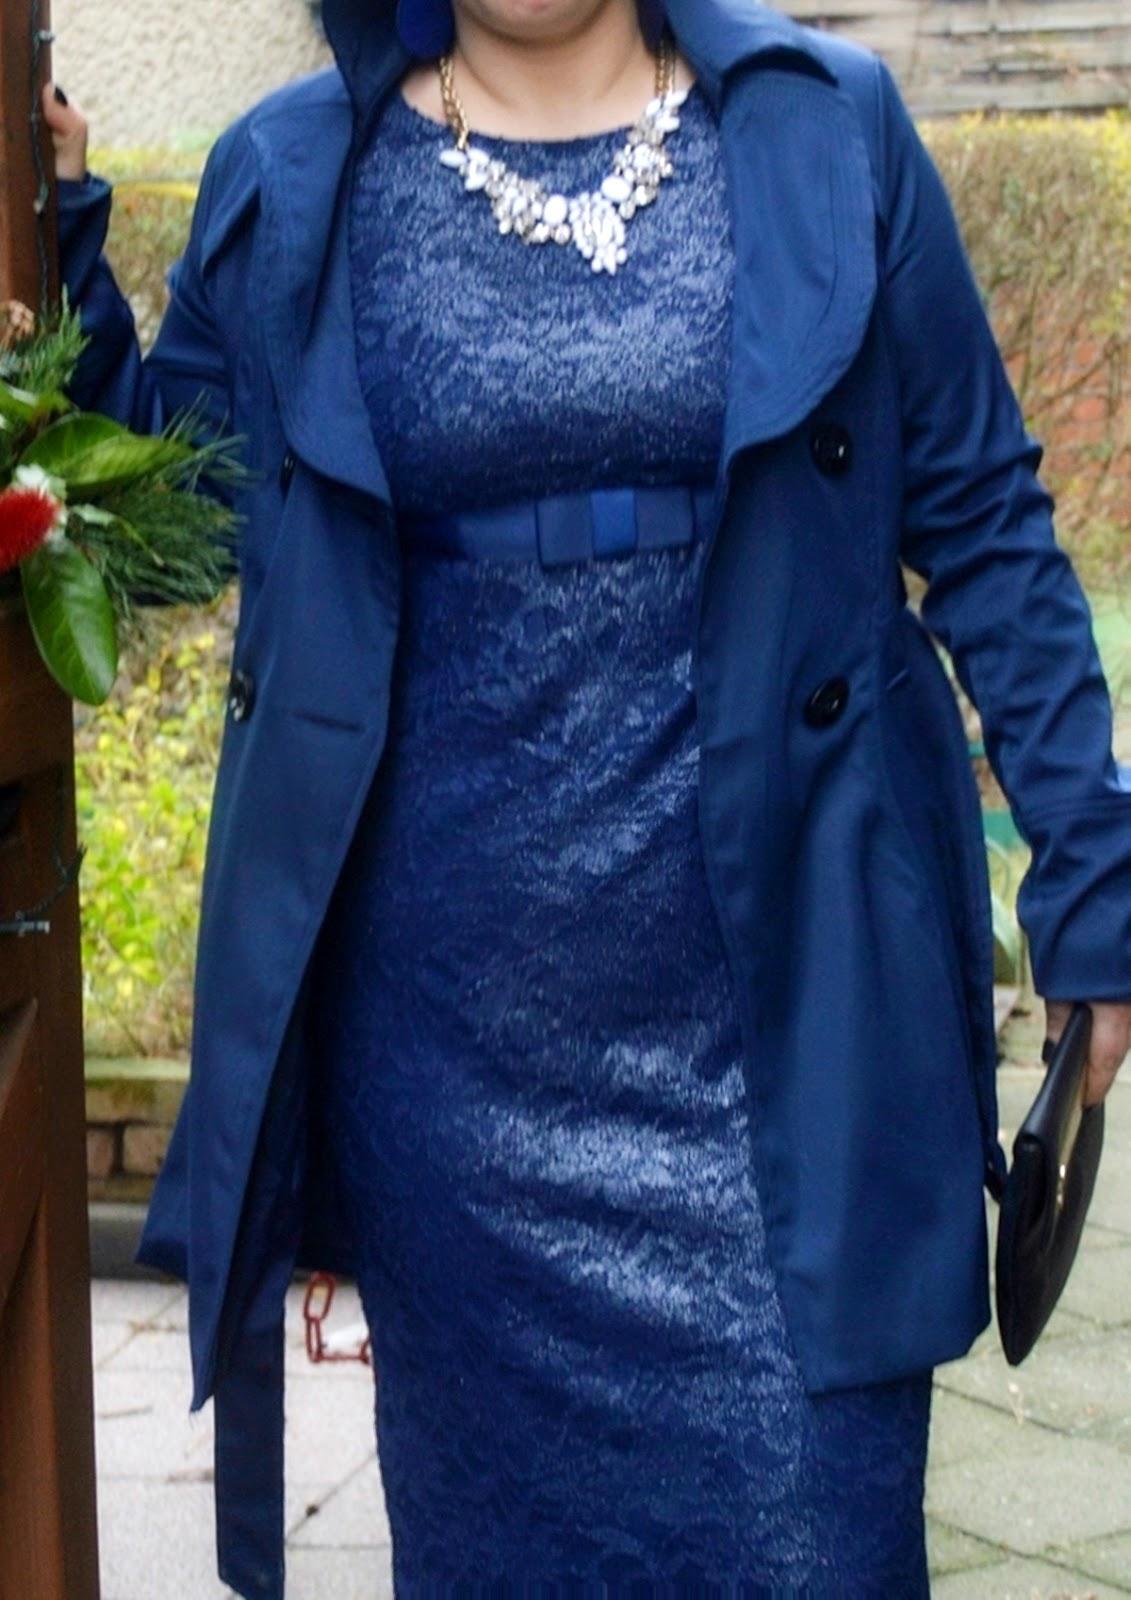 2 Dresses for Christmas - Blue Asos Maternity Dress Pic 1